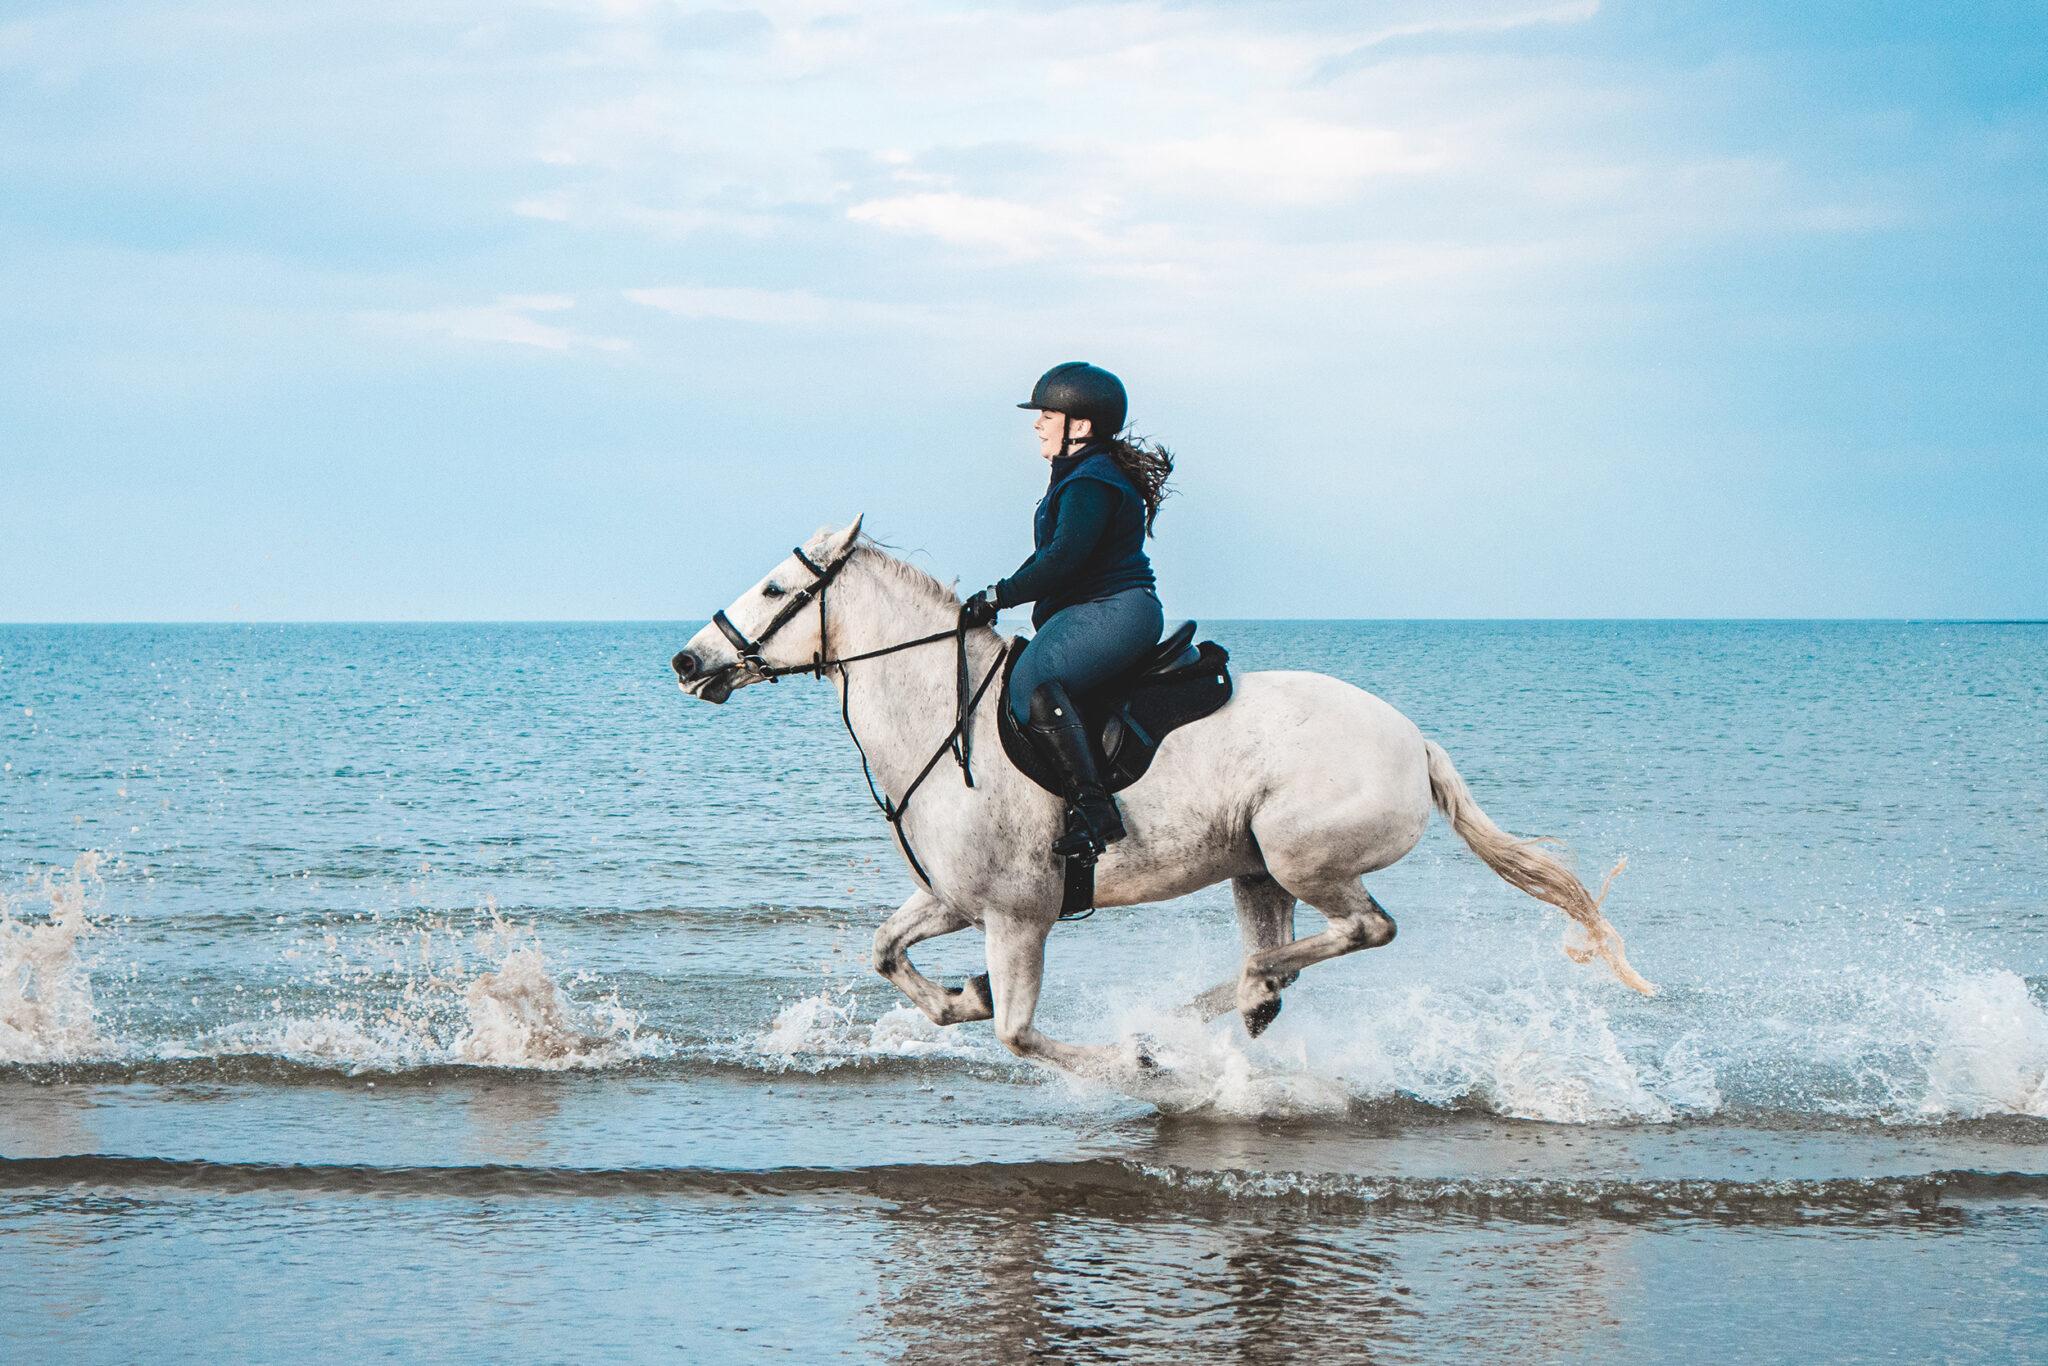 Horse Breed: Connemara - photo by Kyle Mackie - Globetrotting horse riding holidays